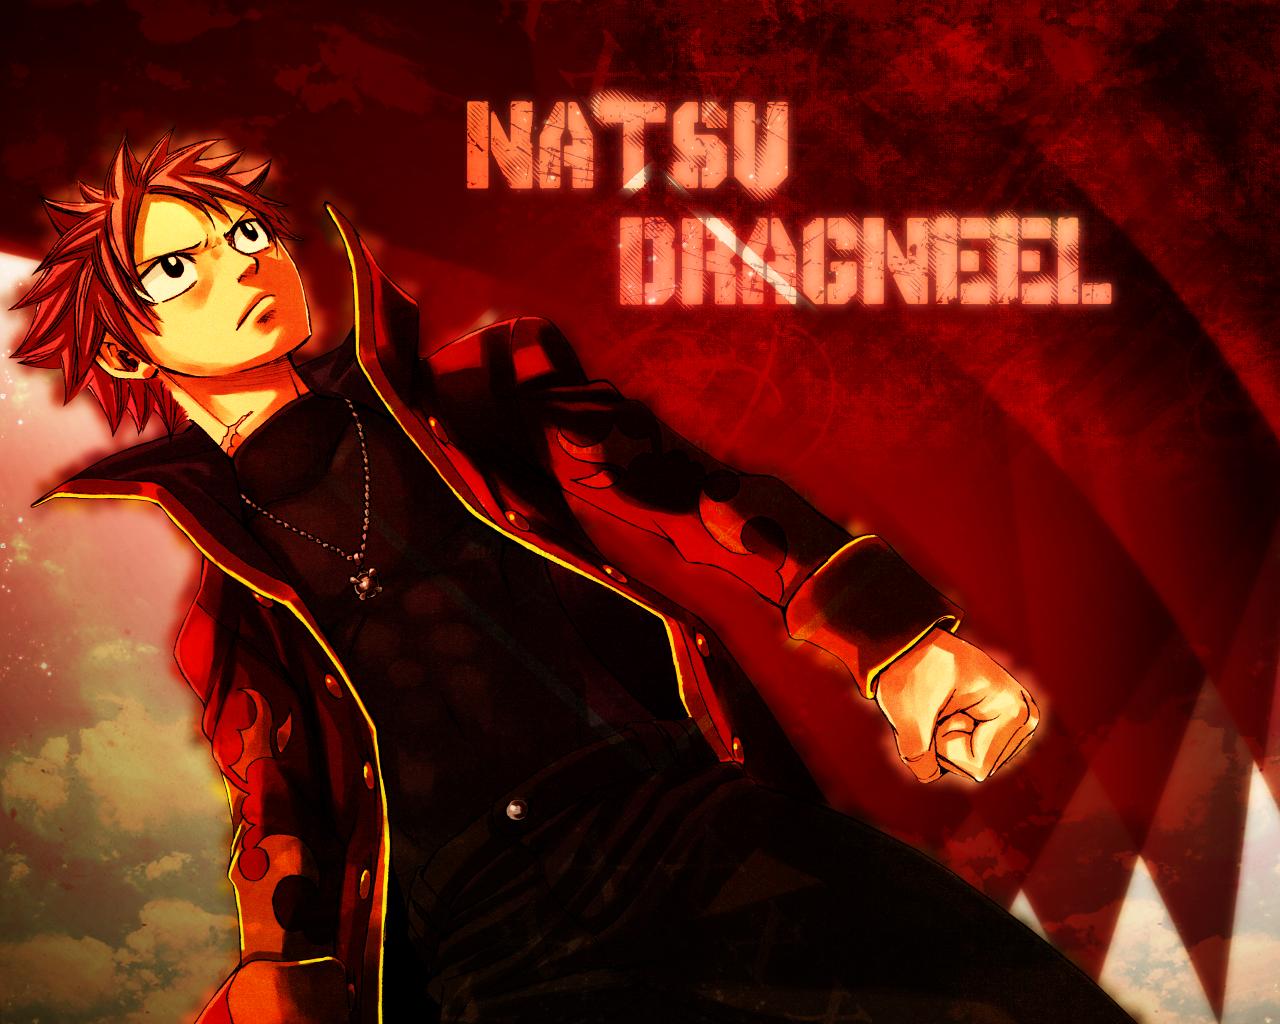 Best Natsu Dragneel Wallpaper PC 420 3100 Wallpaper Wallpaper 1280x1024